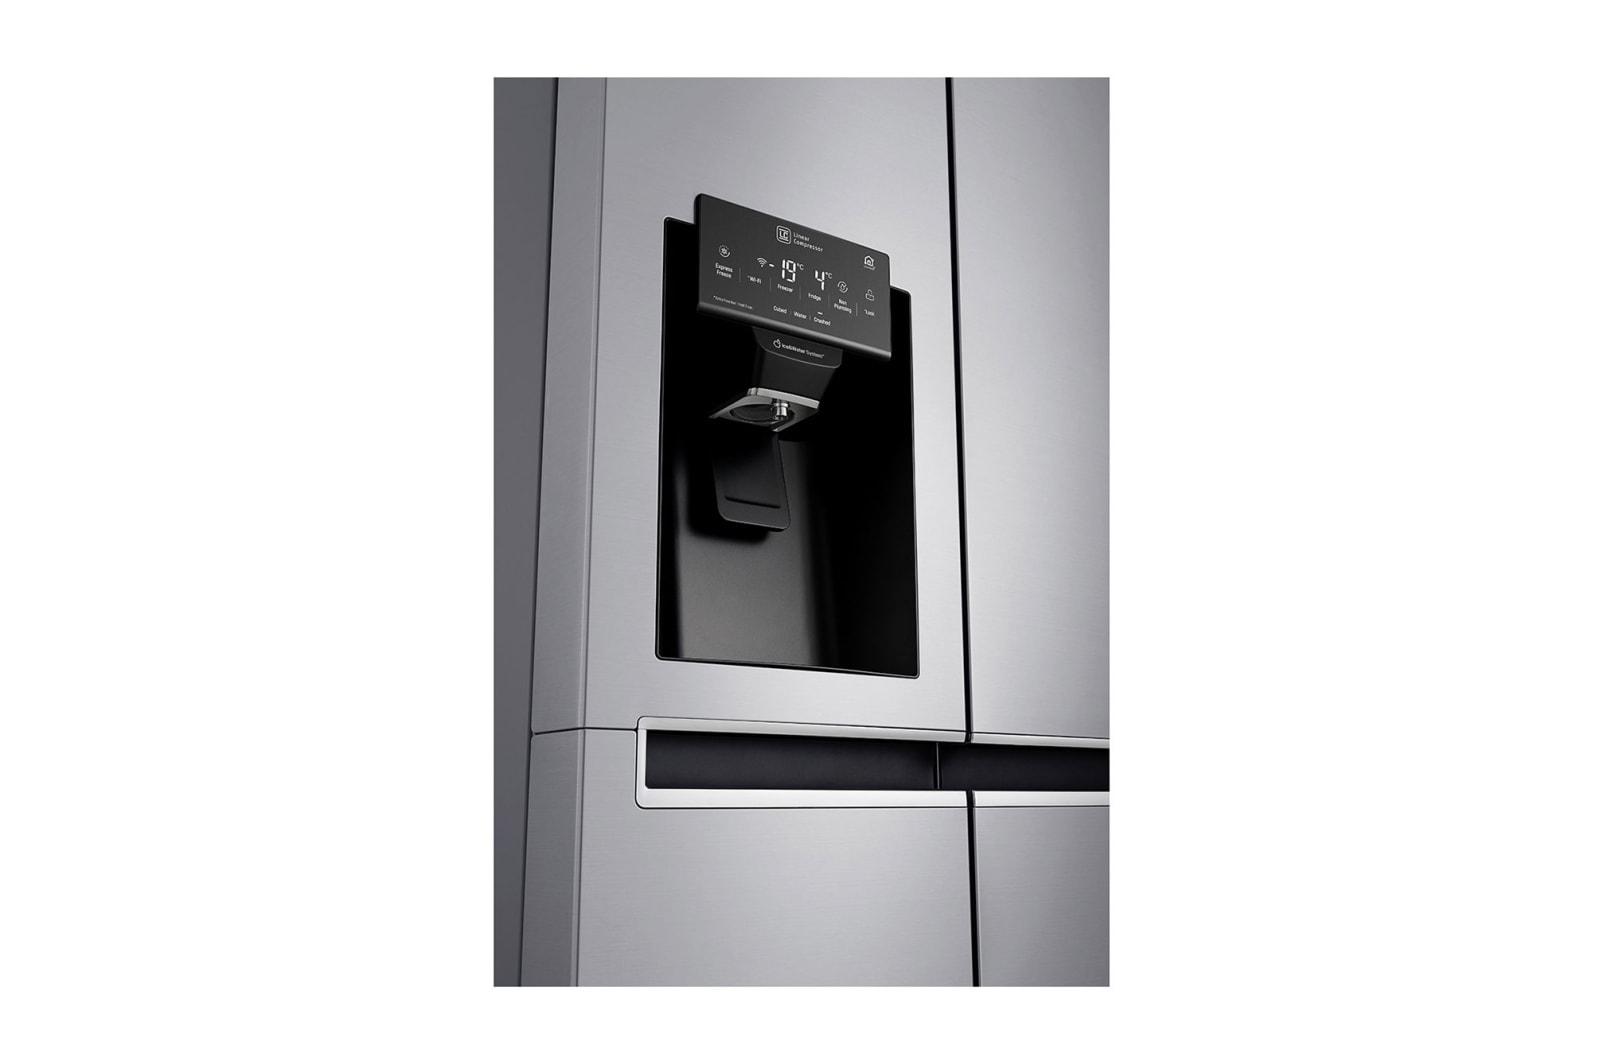 Side By Side Kühlschrank Wasseranschluss : Lg gsl461icez side by side kühlschrank a lg deutschland